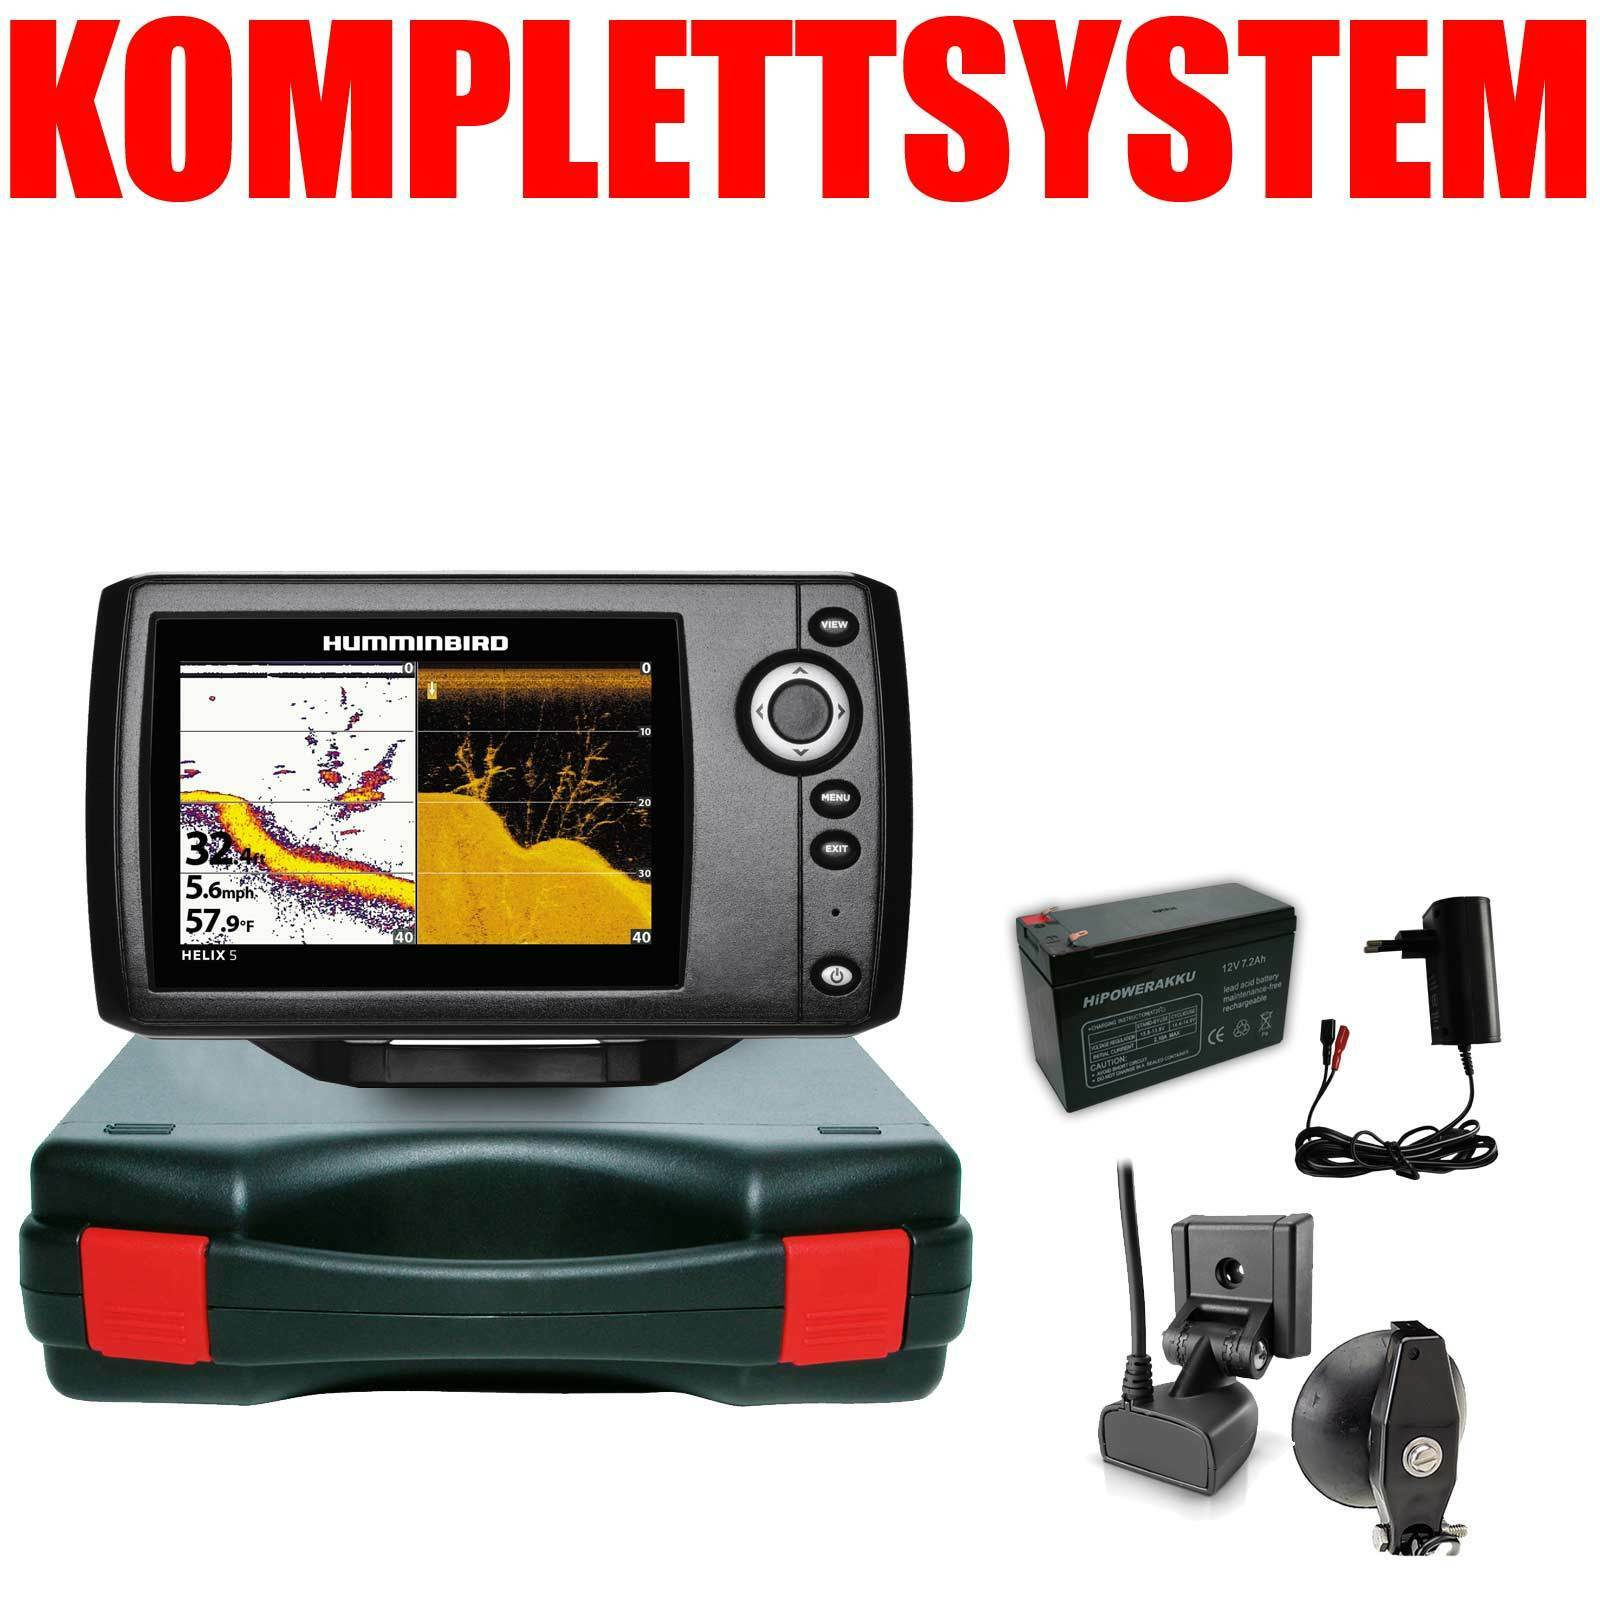 Humminbird Echolot Portabel Basic Komplettsystem - Helix 5 DI G2 Down Imaging